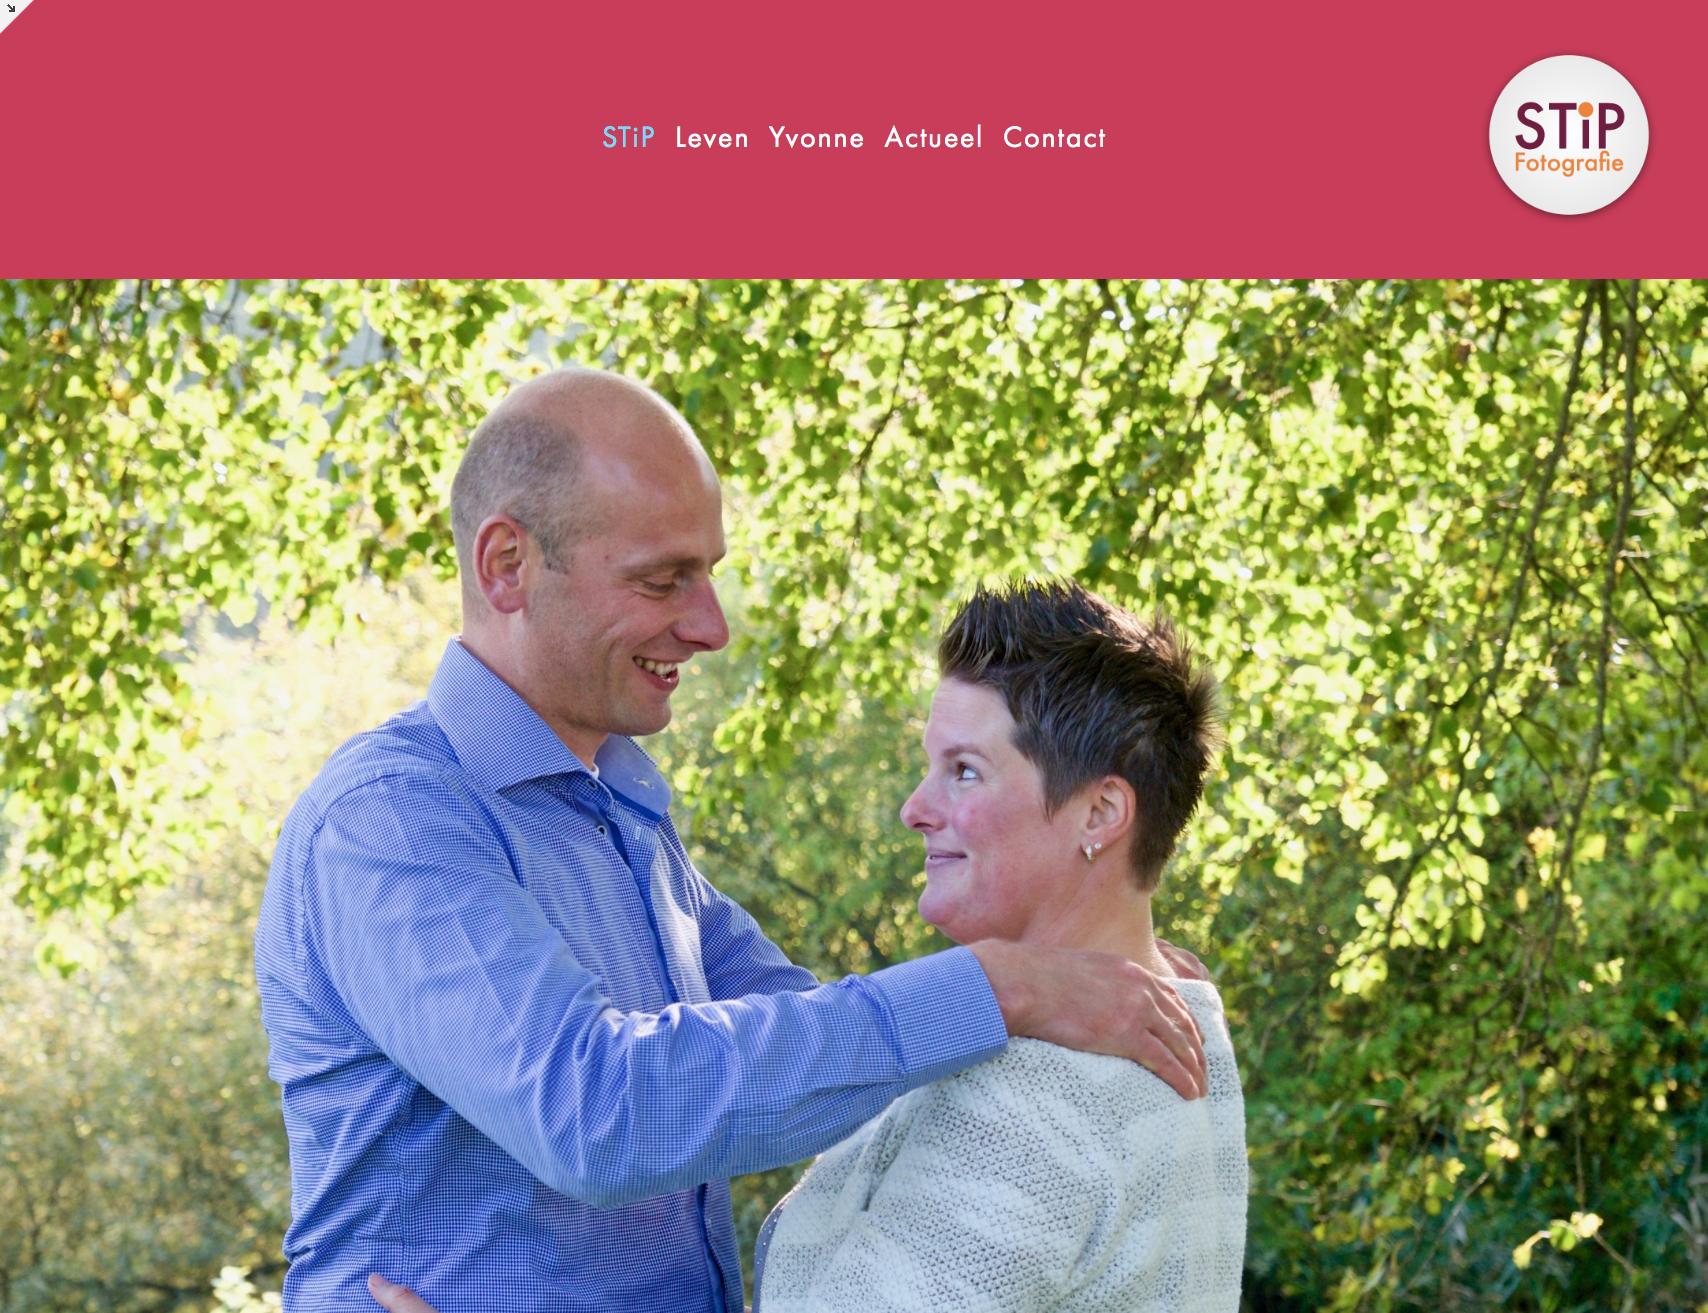 Een sprekendere homepage